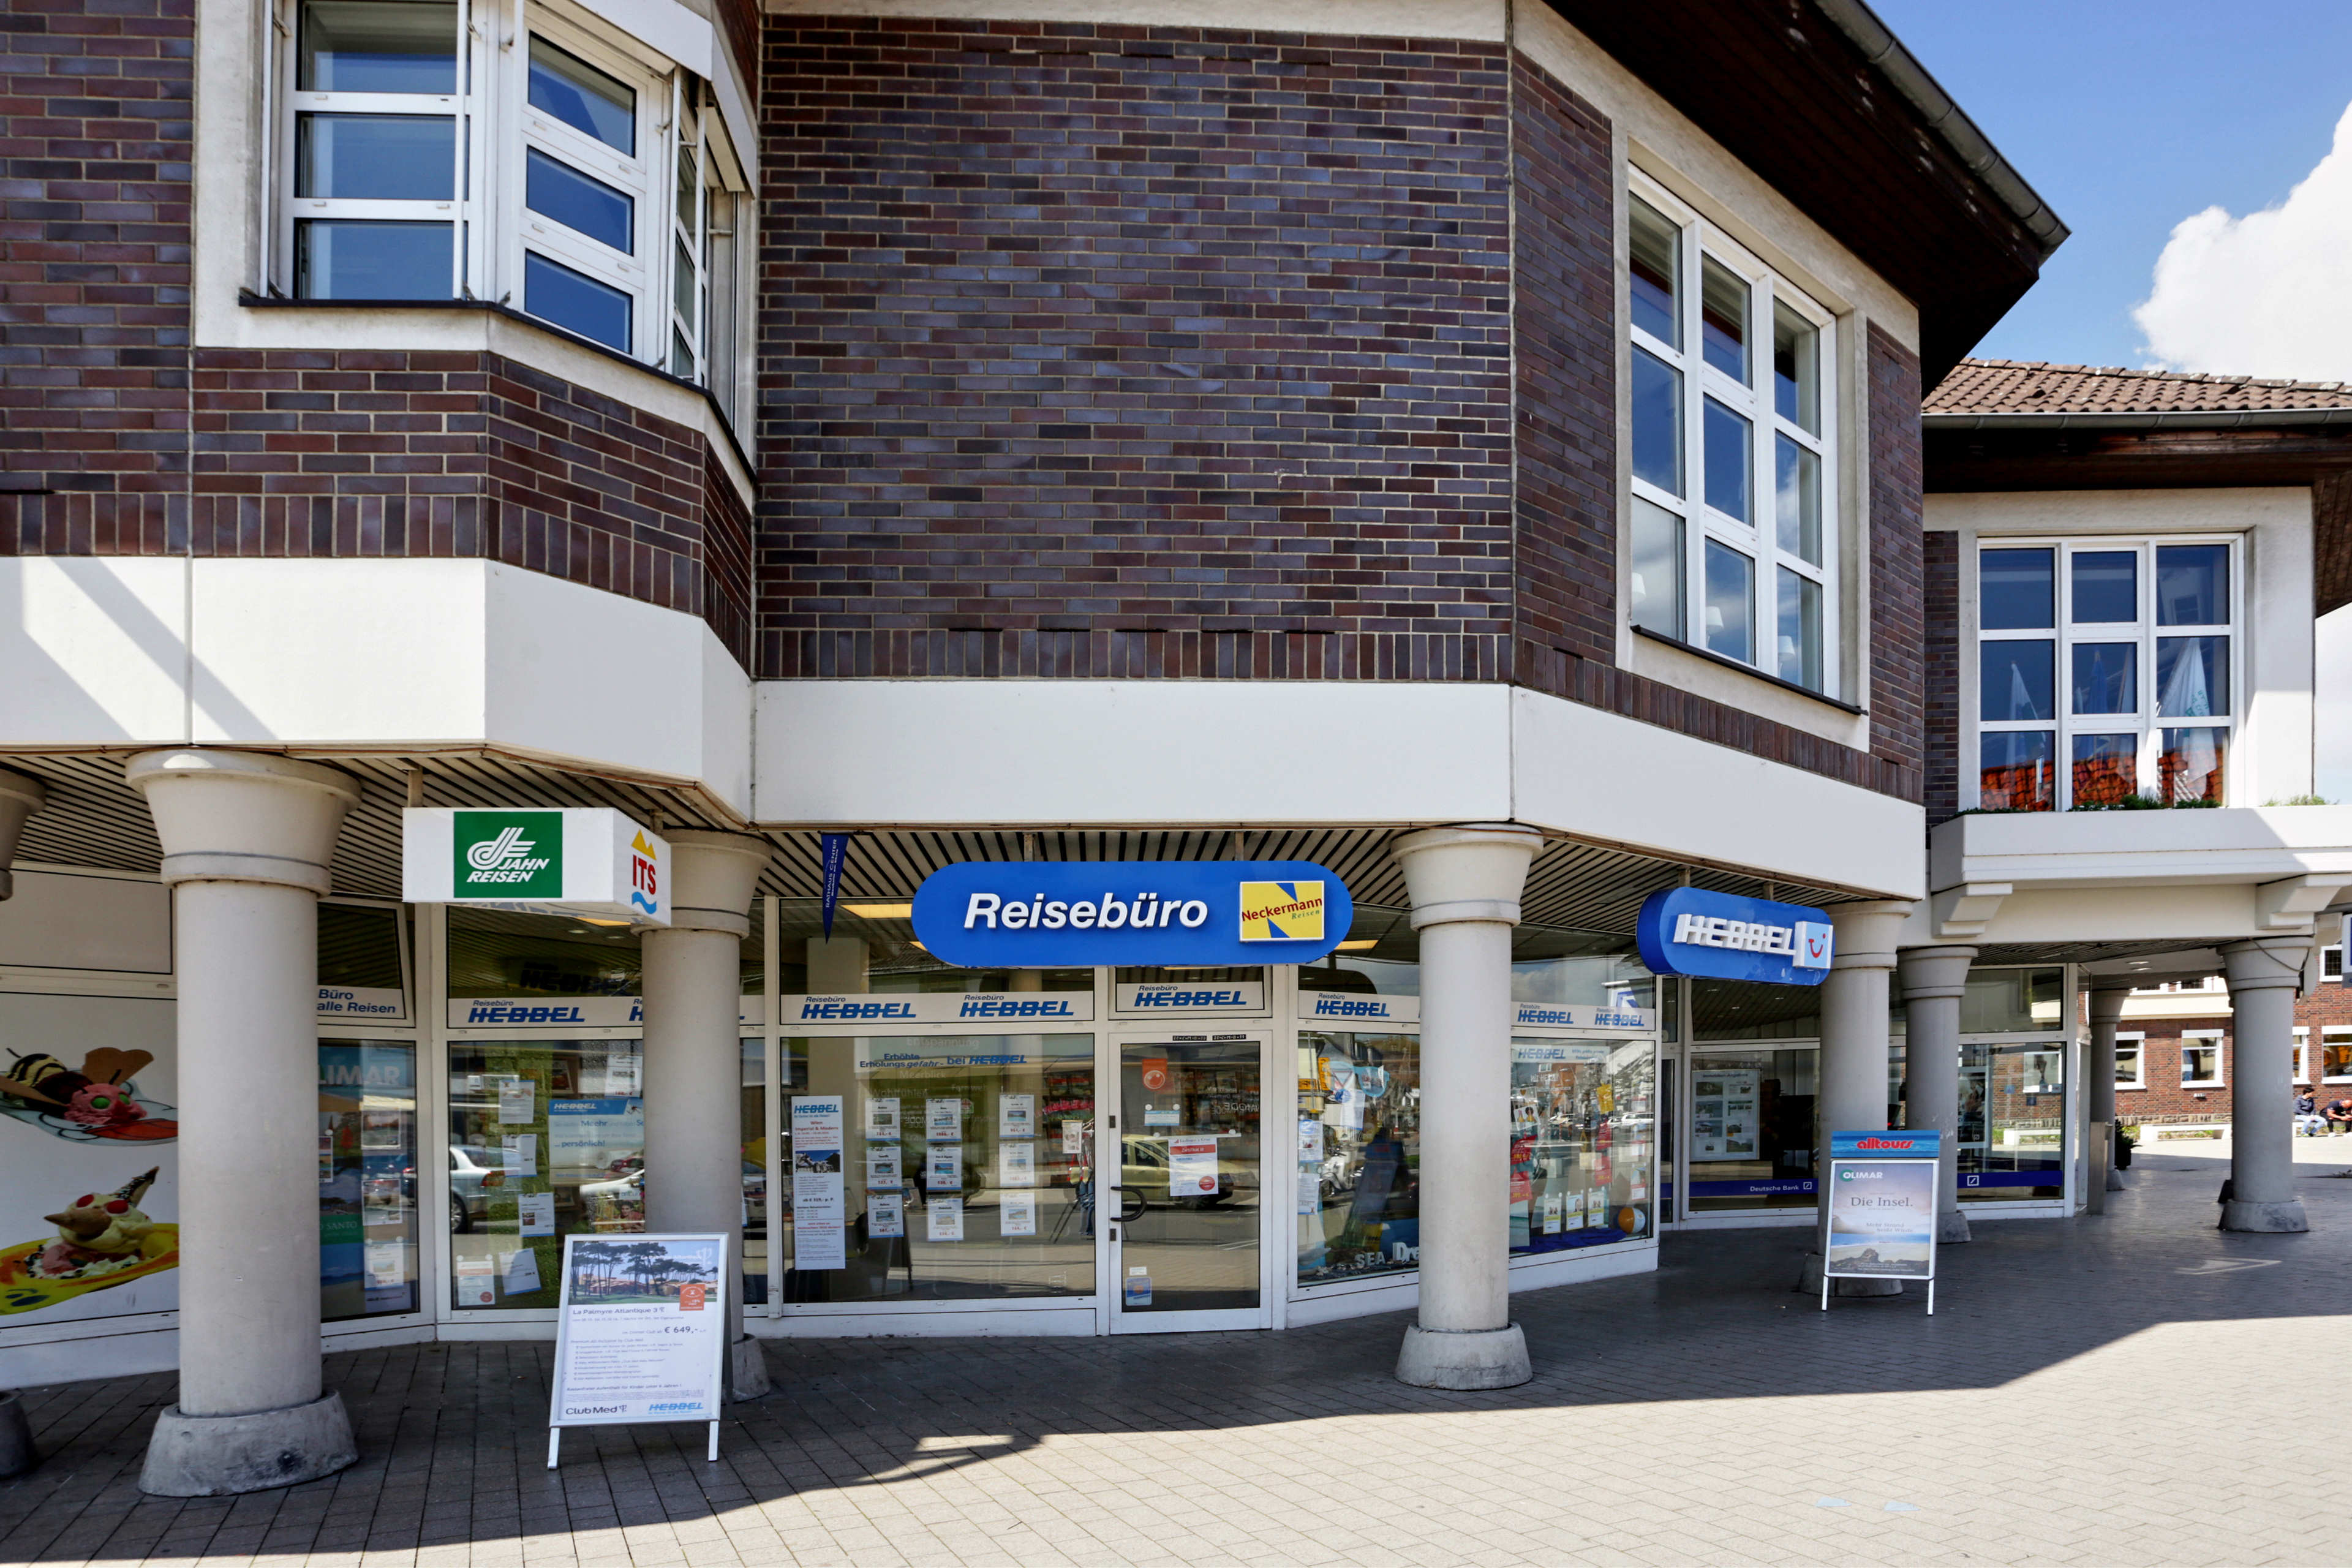 Reisebüro Hebbel Monheim